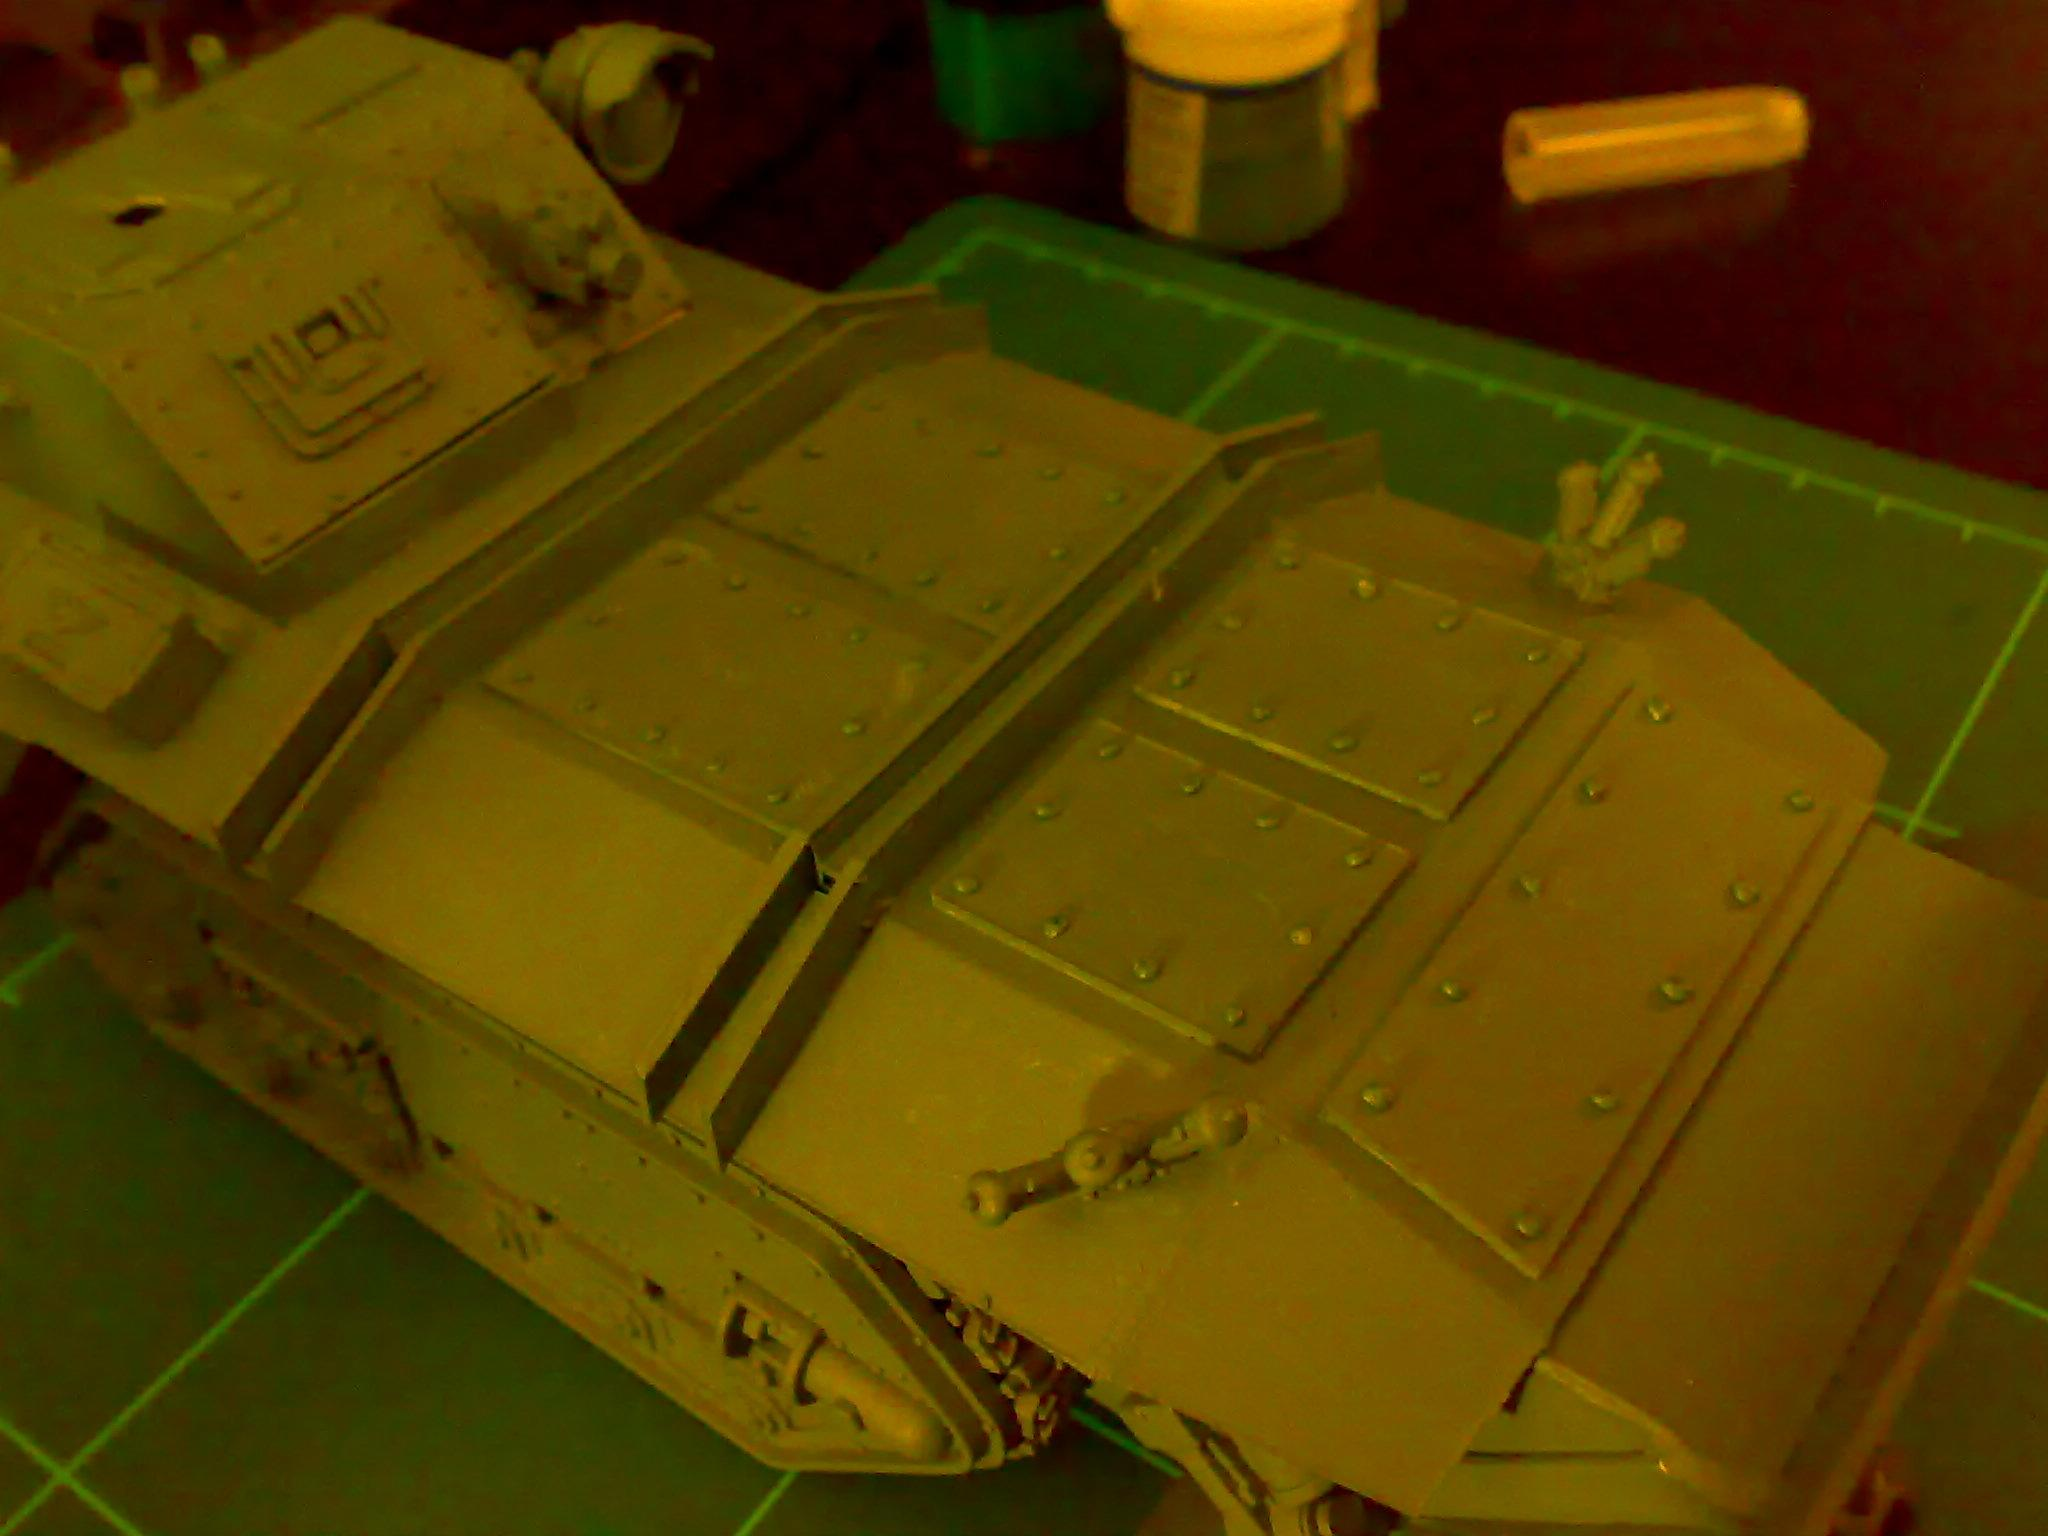 Chimera, Conversion, Gorgon, Imperial Guard, Warhammer 40,000, Work In Progress